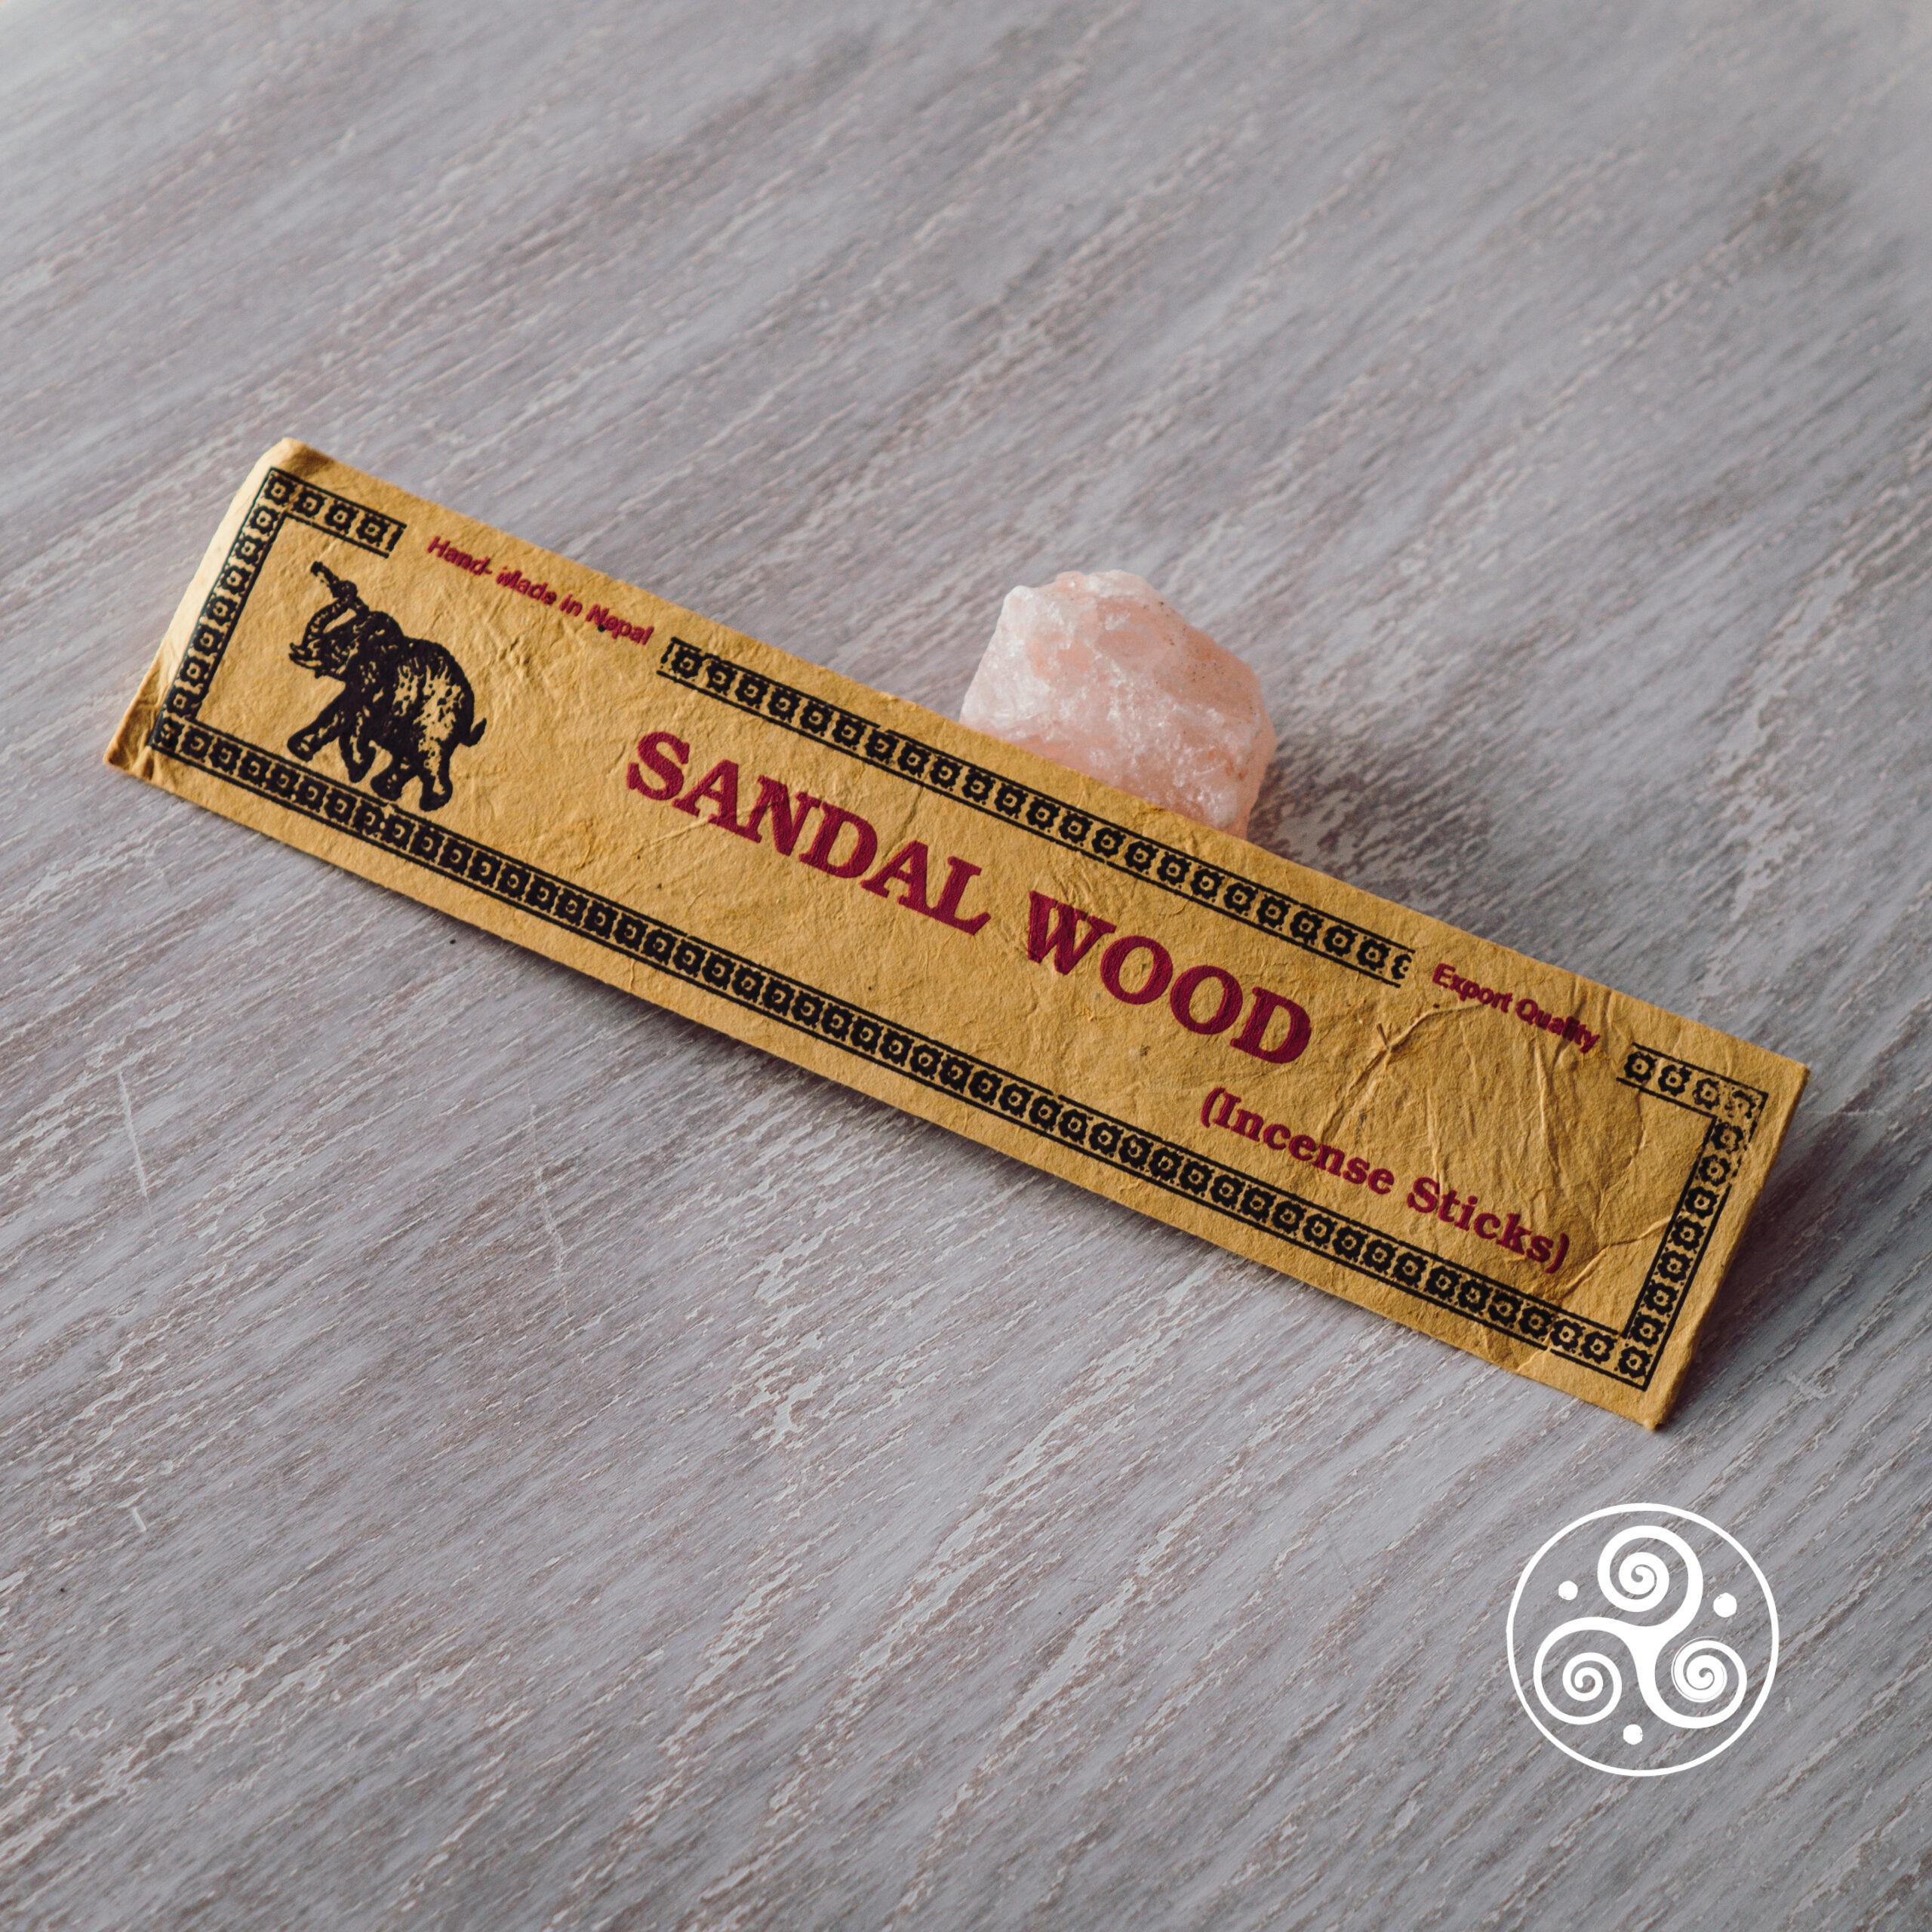 Nepali Lakta Incense Sticks - Sandal Wood